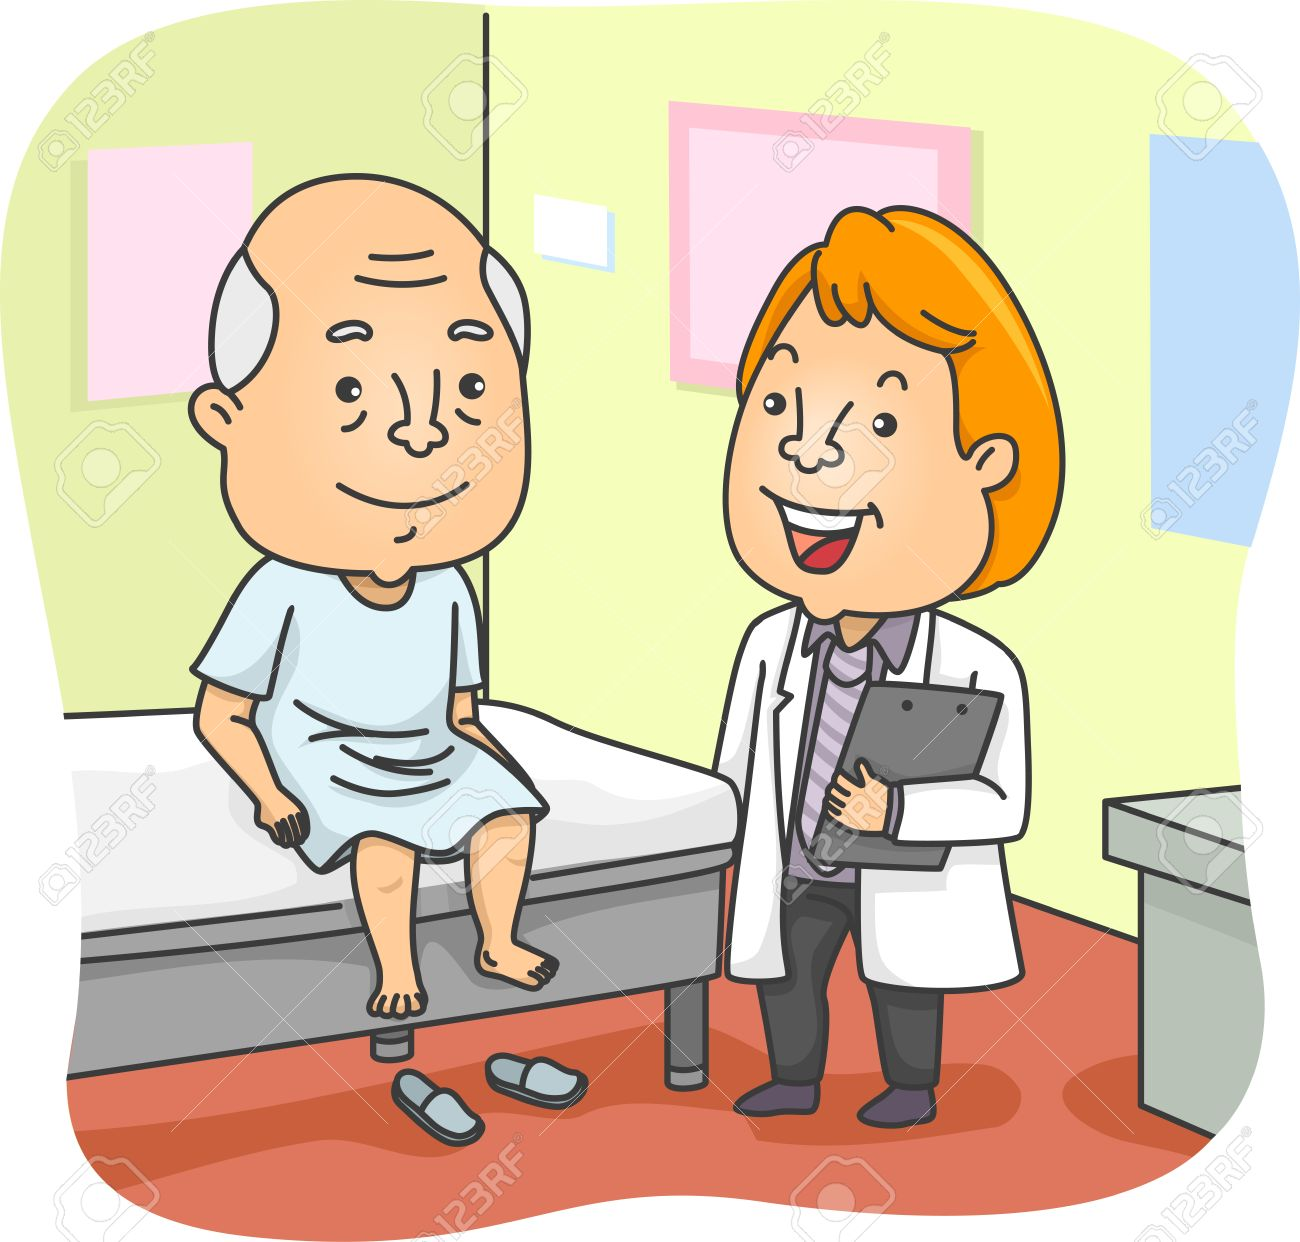 Medical clipart medical exam. Free examination download clip